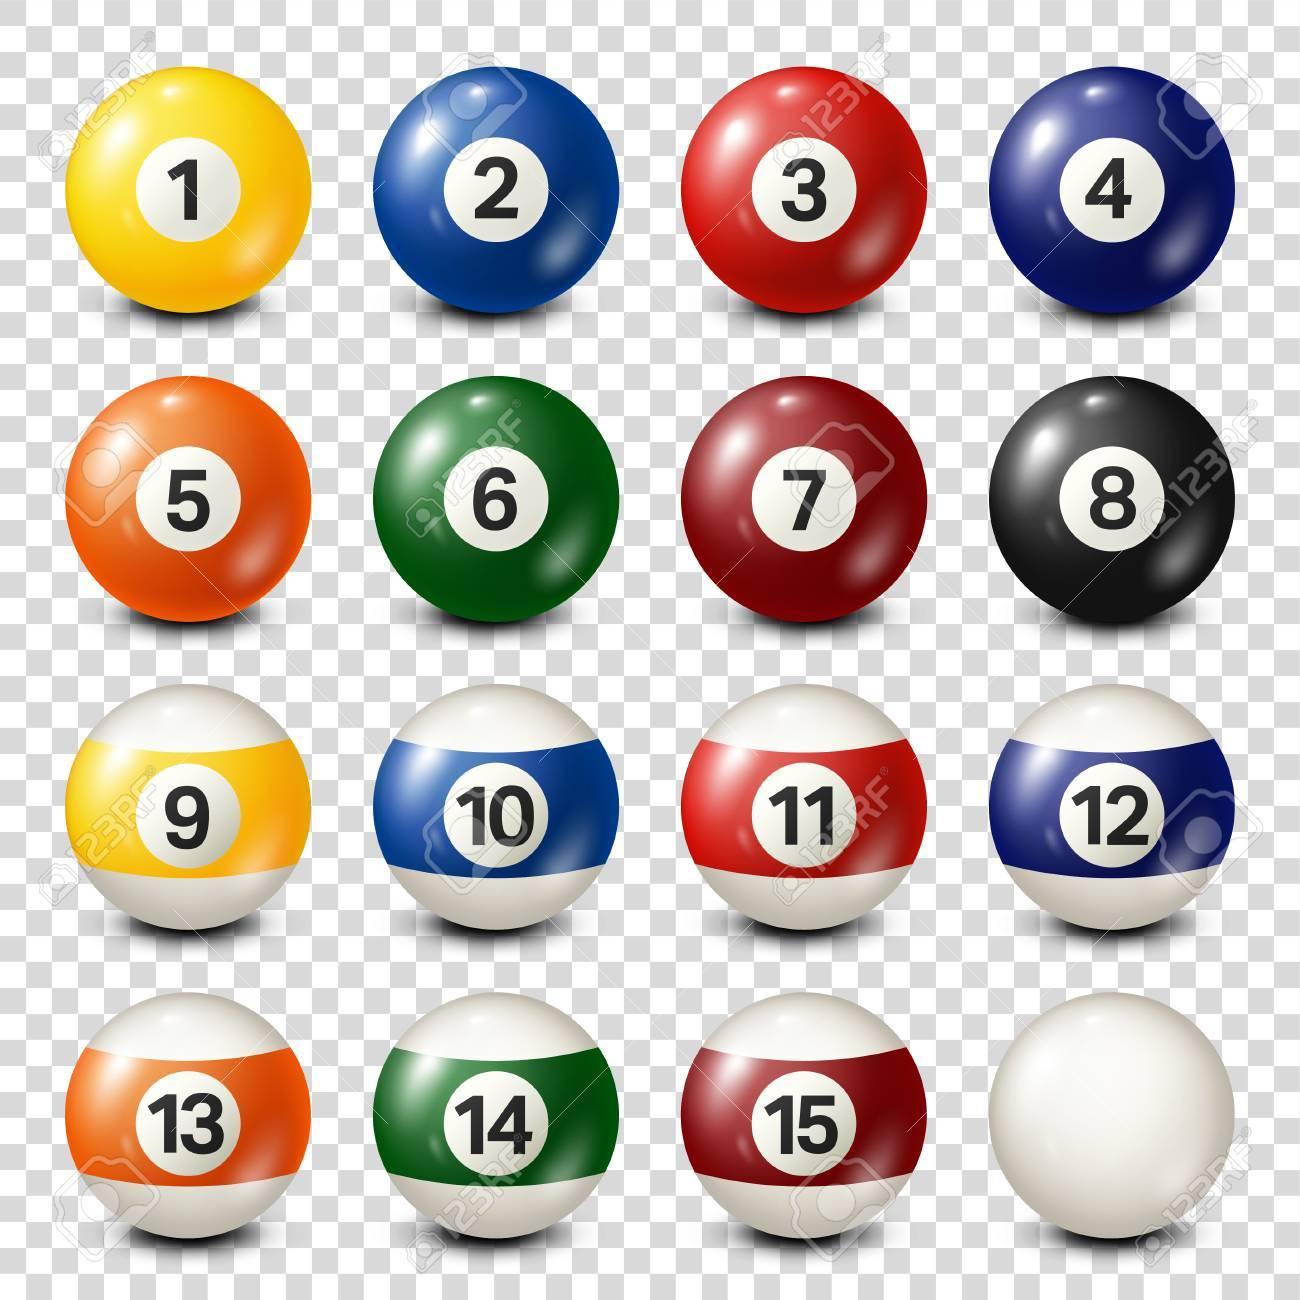 Billiard,pool balls collection. Snooker. Transparent background. Vector illustration. - 80446031